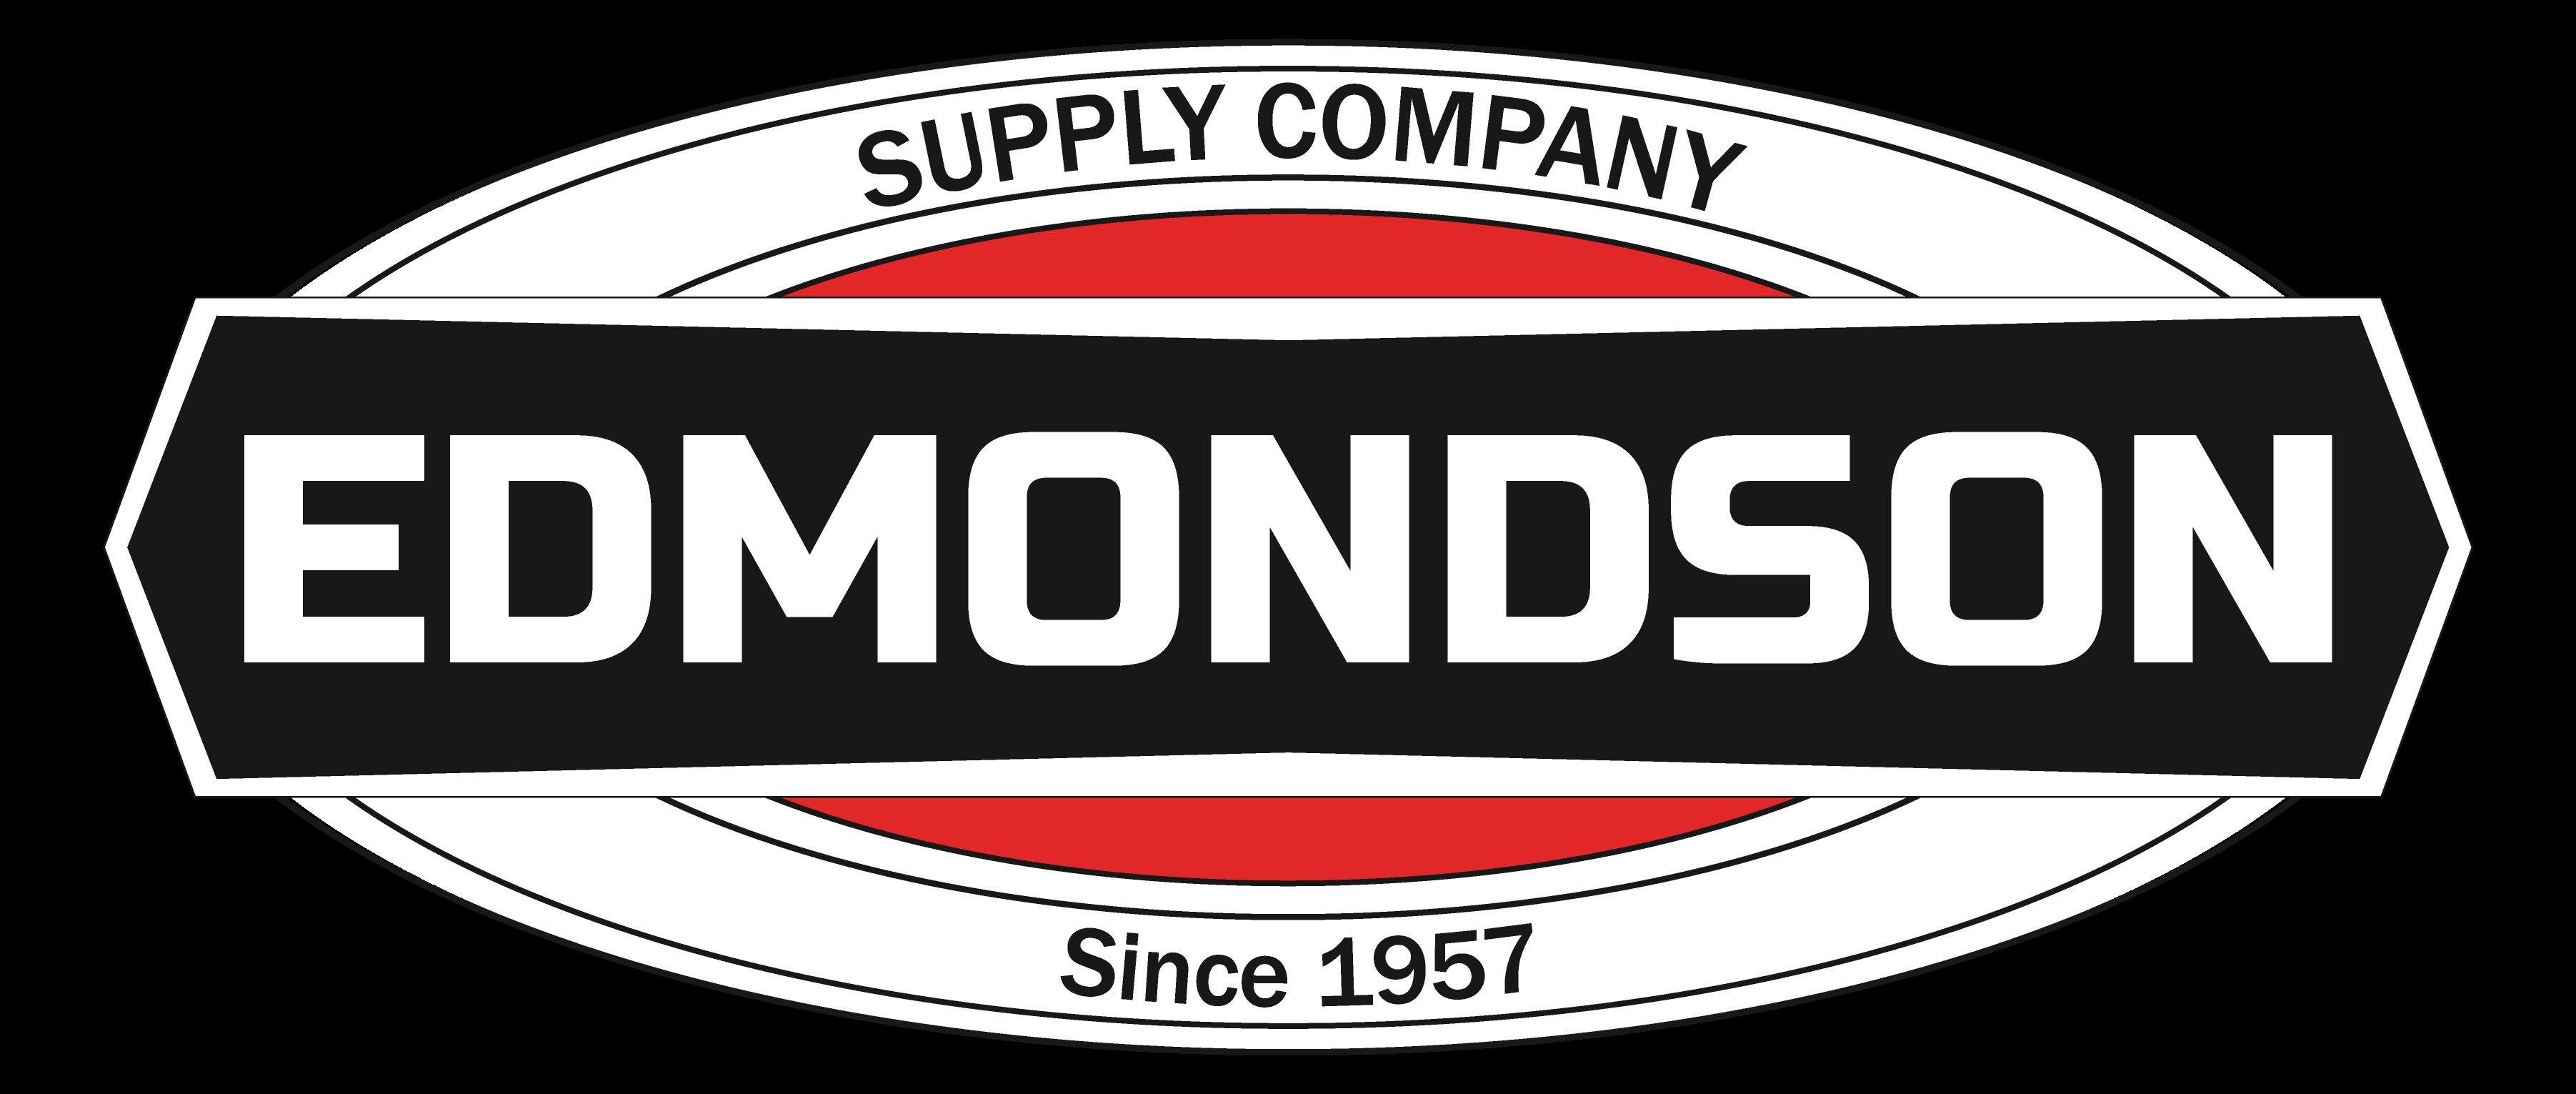 Edmondson Supply Company